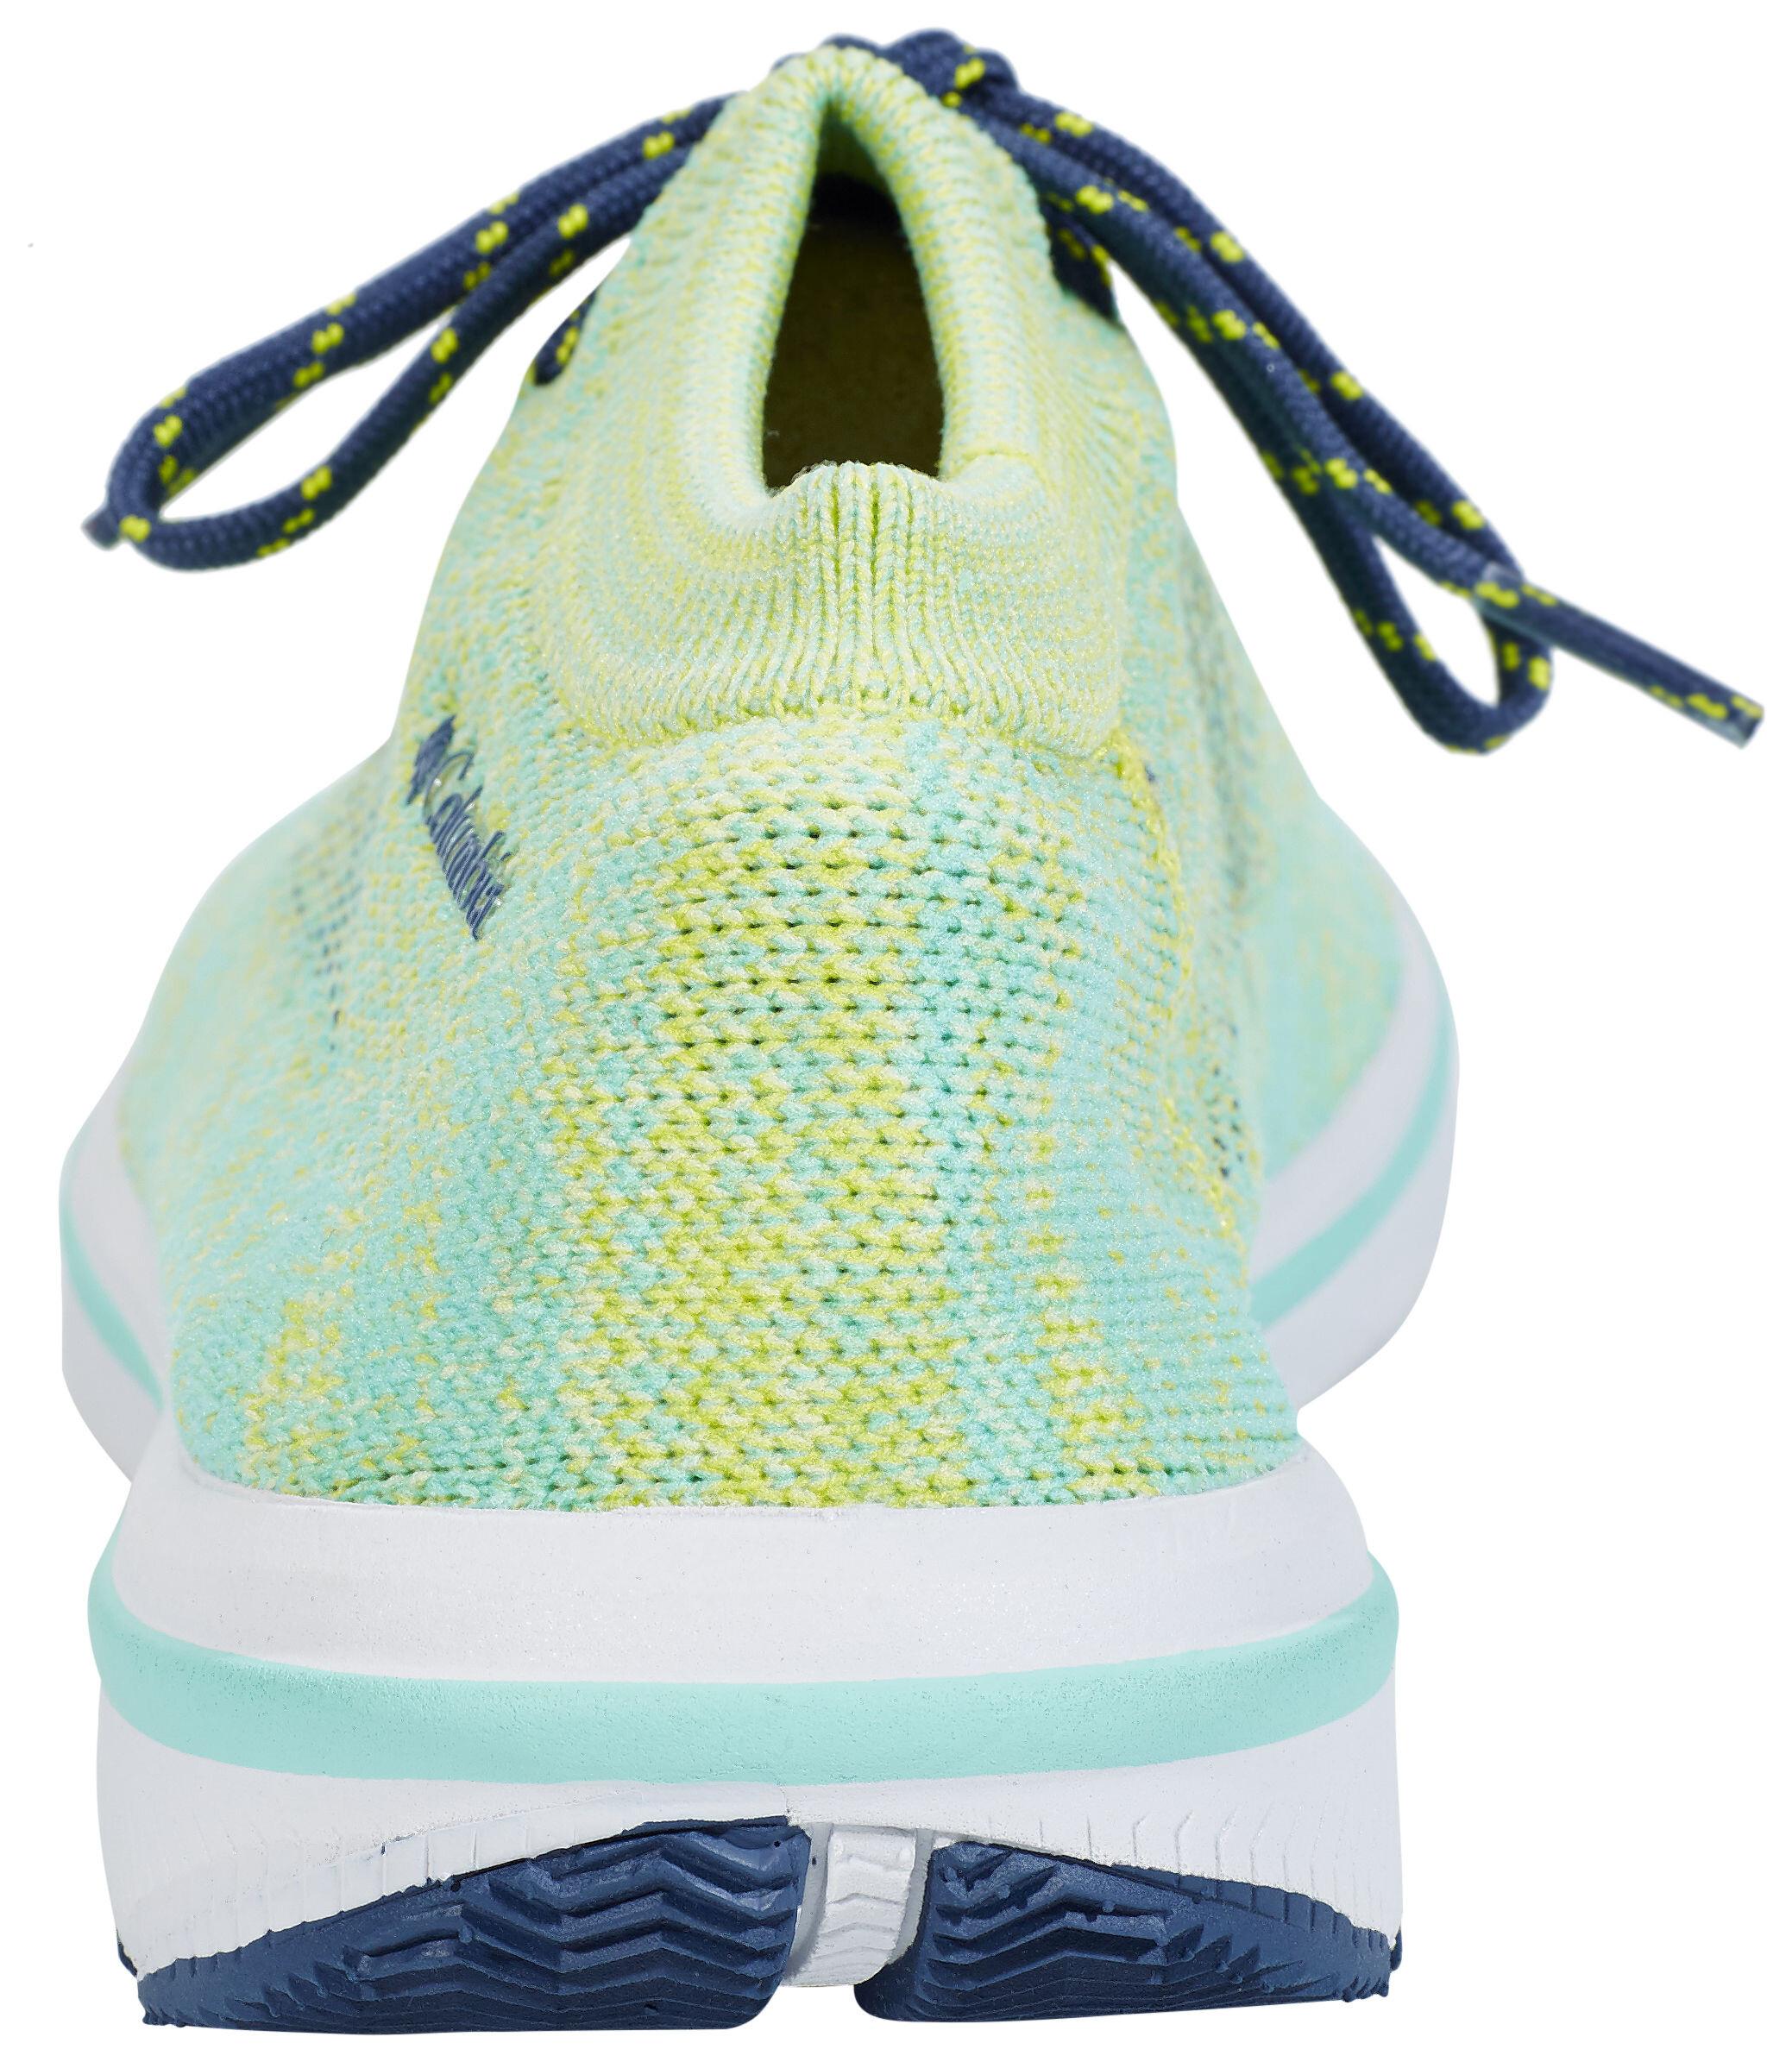 Columbia Chimera Lace Shoes Women Zour Aquarium Campz De